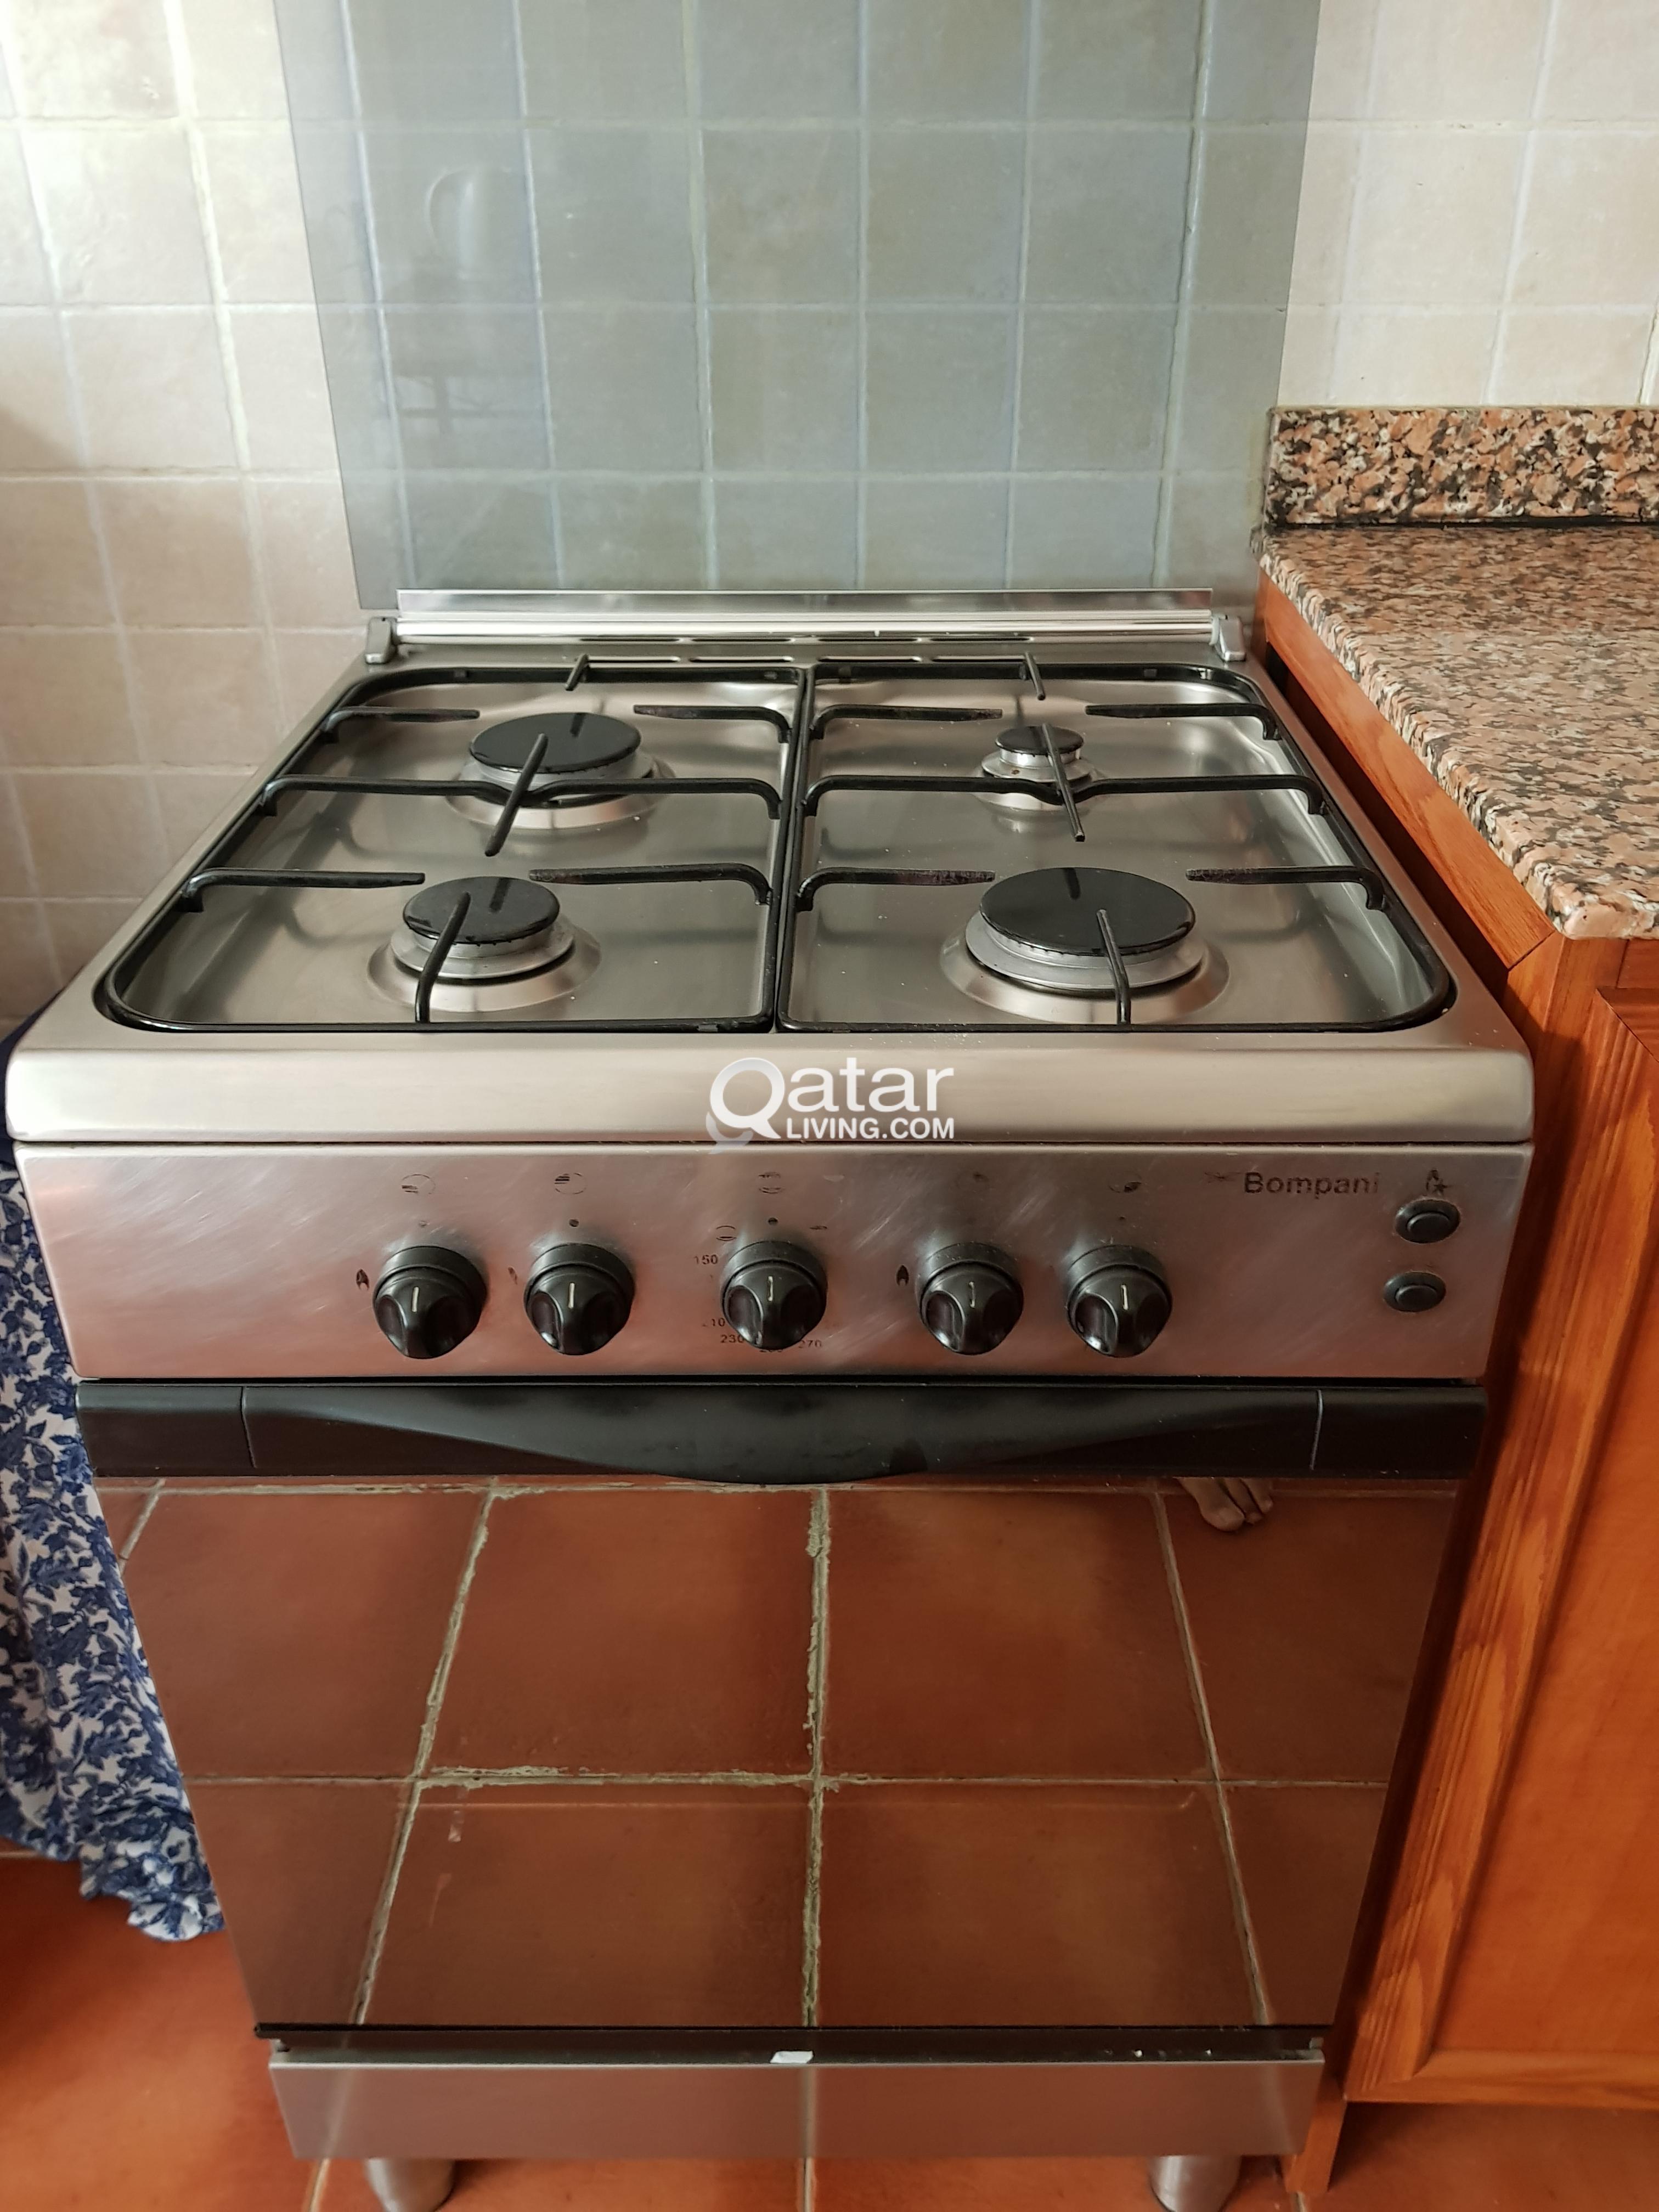 Kitchen Cooking Gas غاز طهي بحالة جيدة جدا